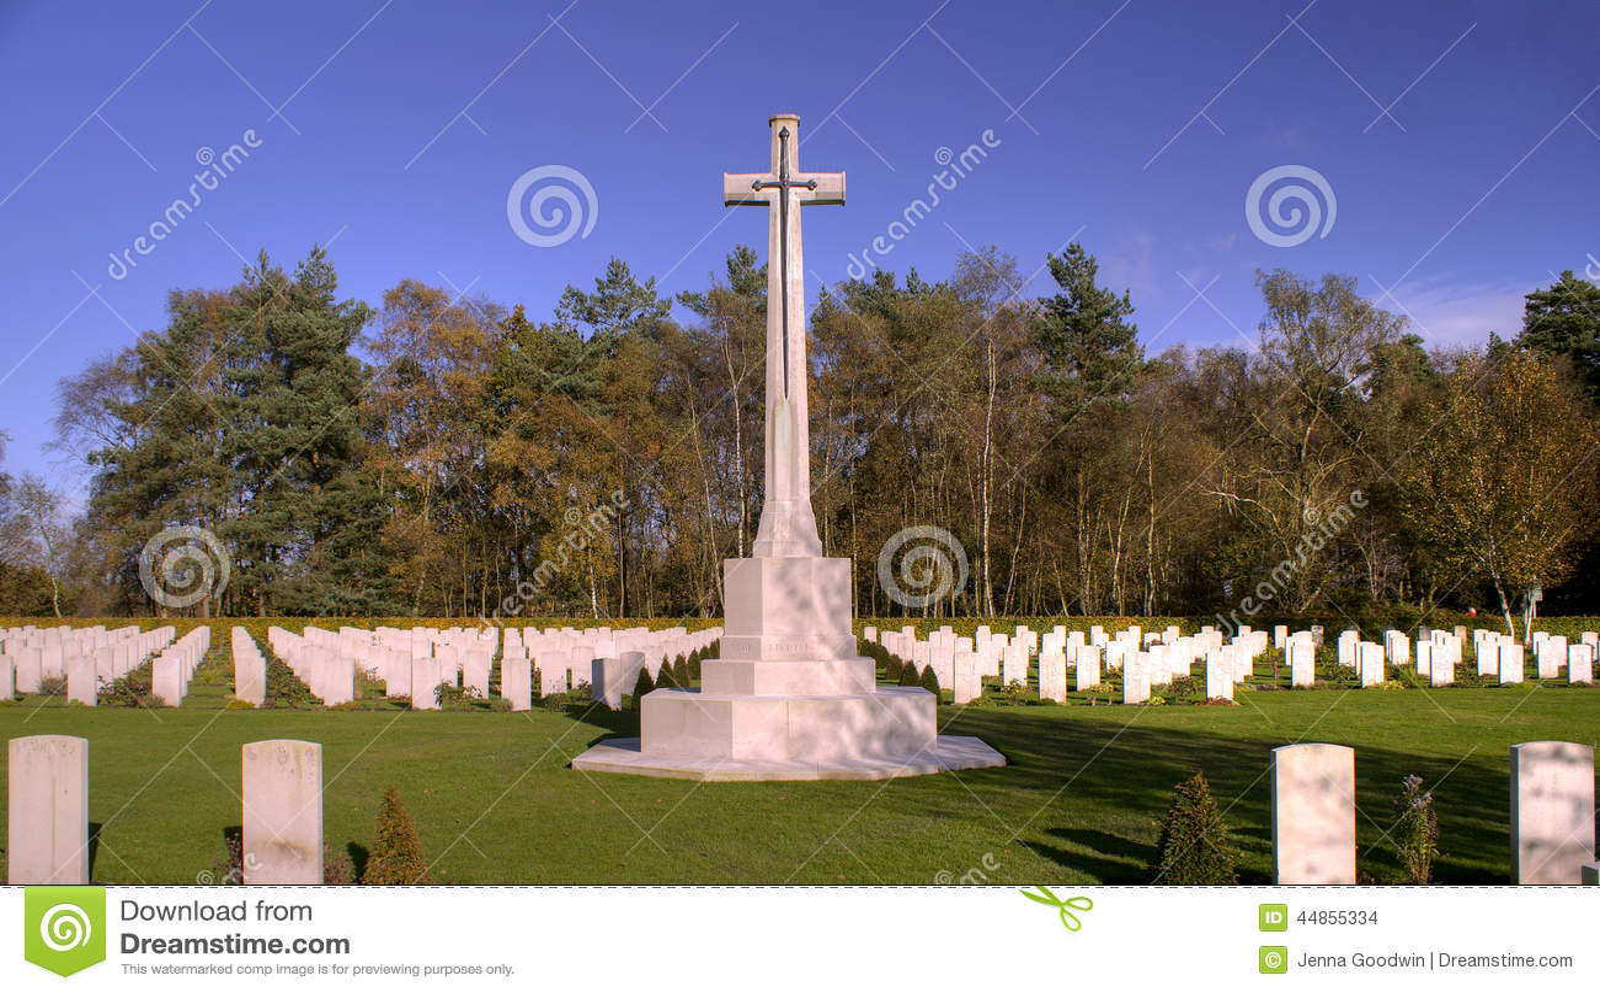 Download Sepulcros de la guerra foto de archivo. Imagen de muerte - 44855334